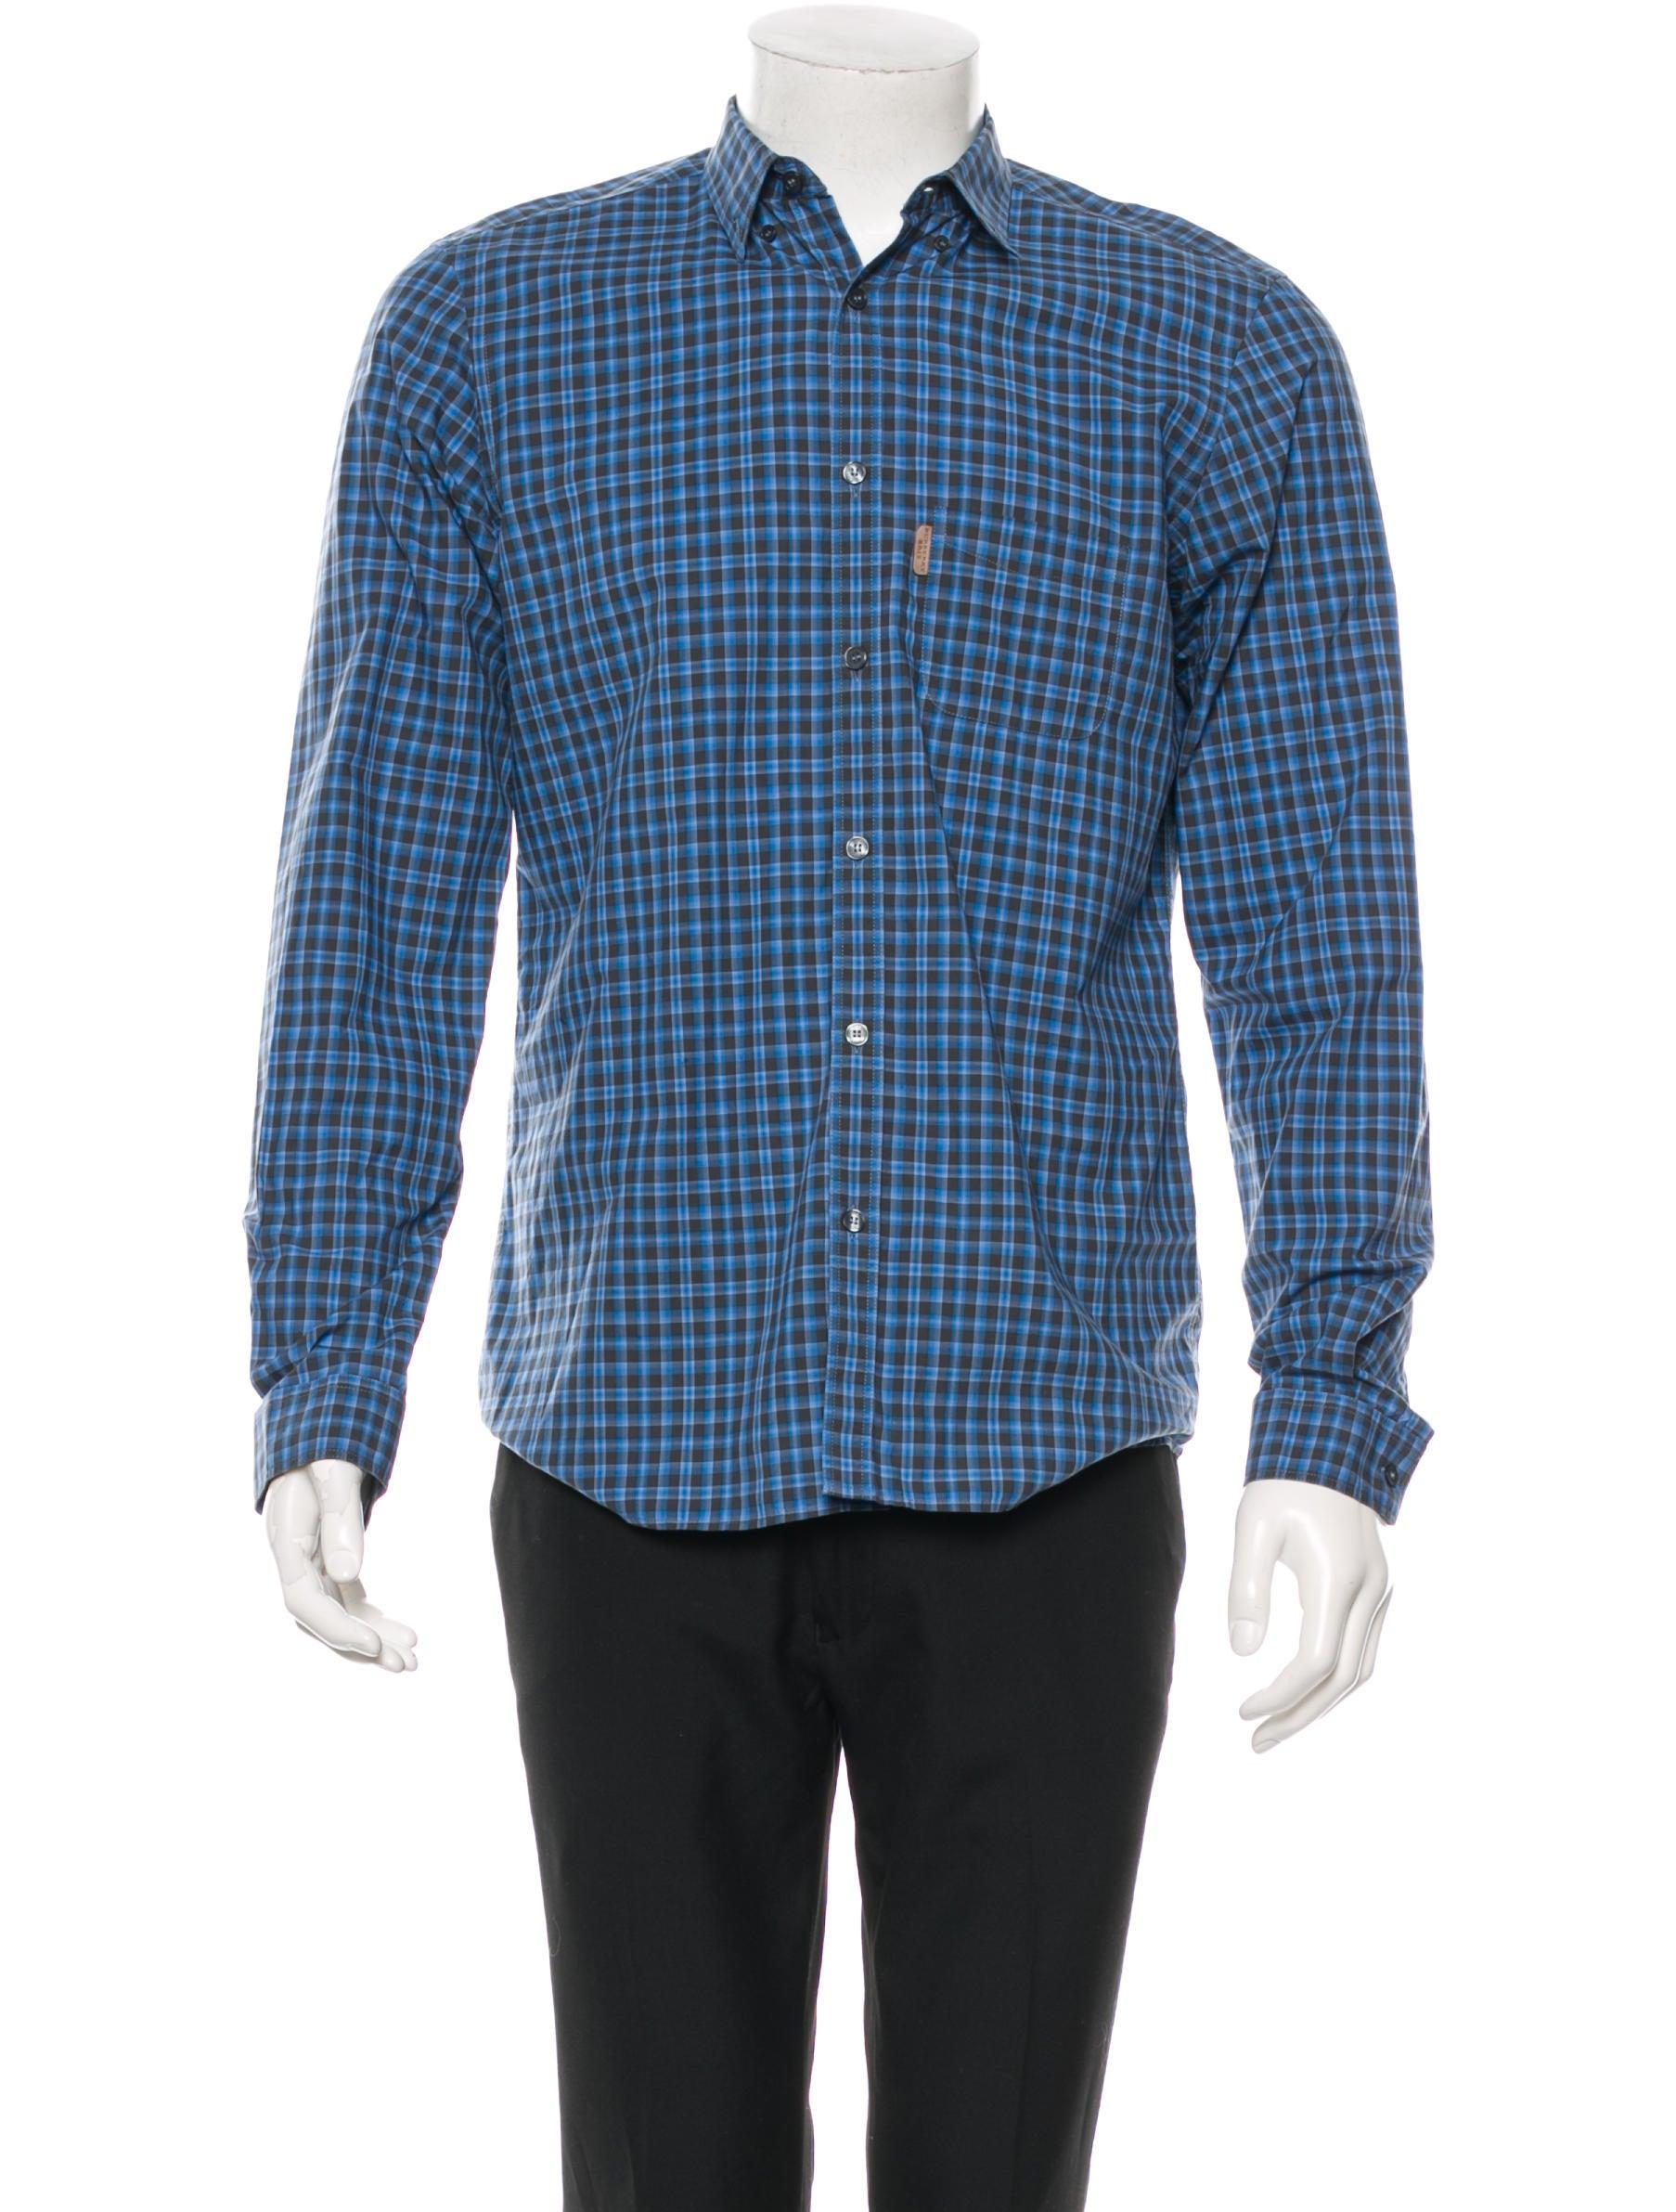 Burberry Brit Plaid Button Up Shirt Mens Shirts